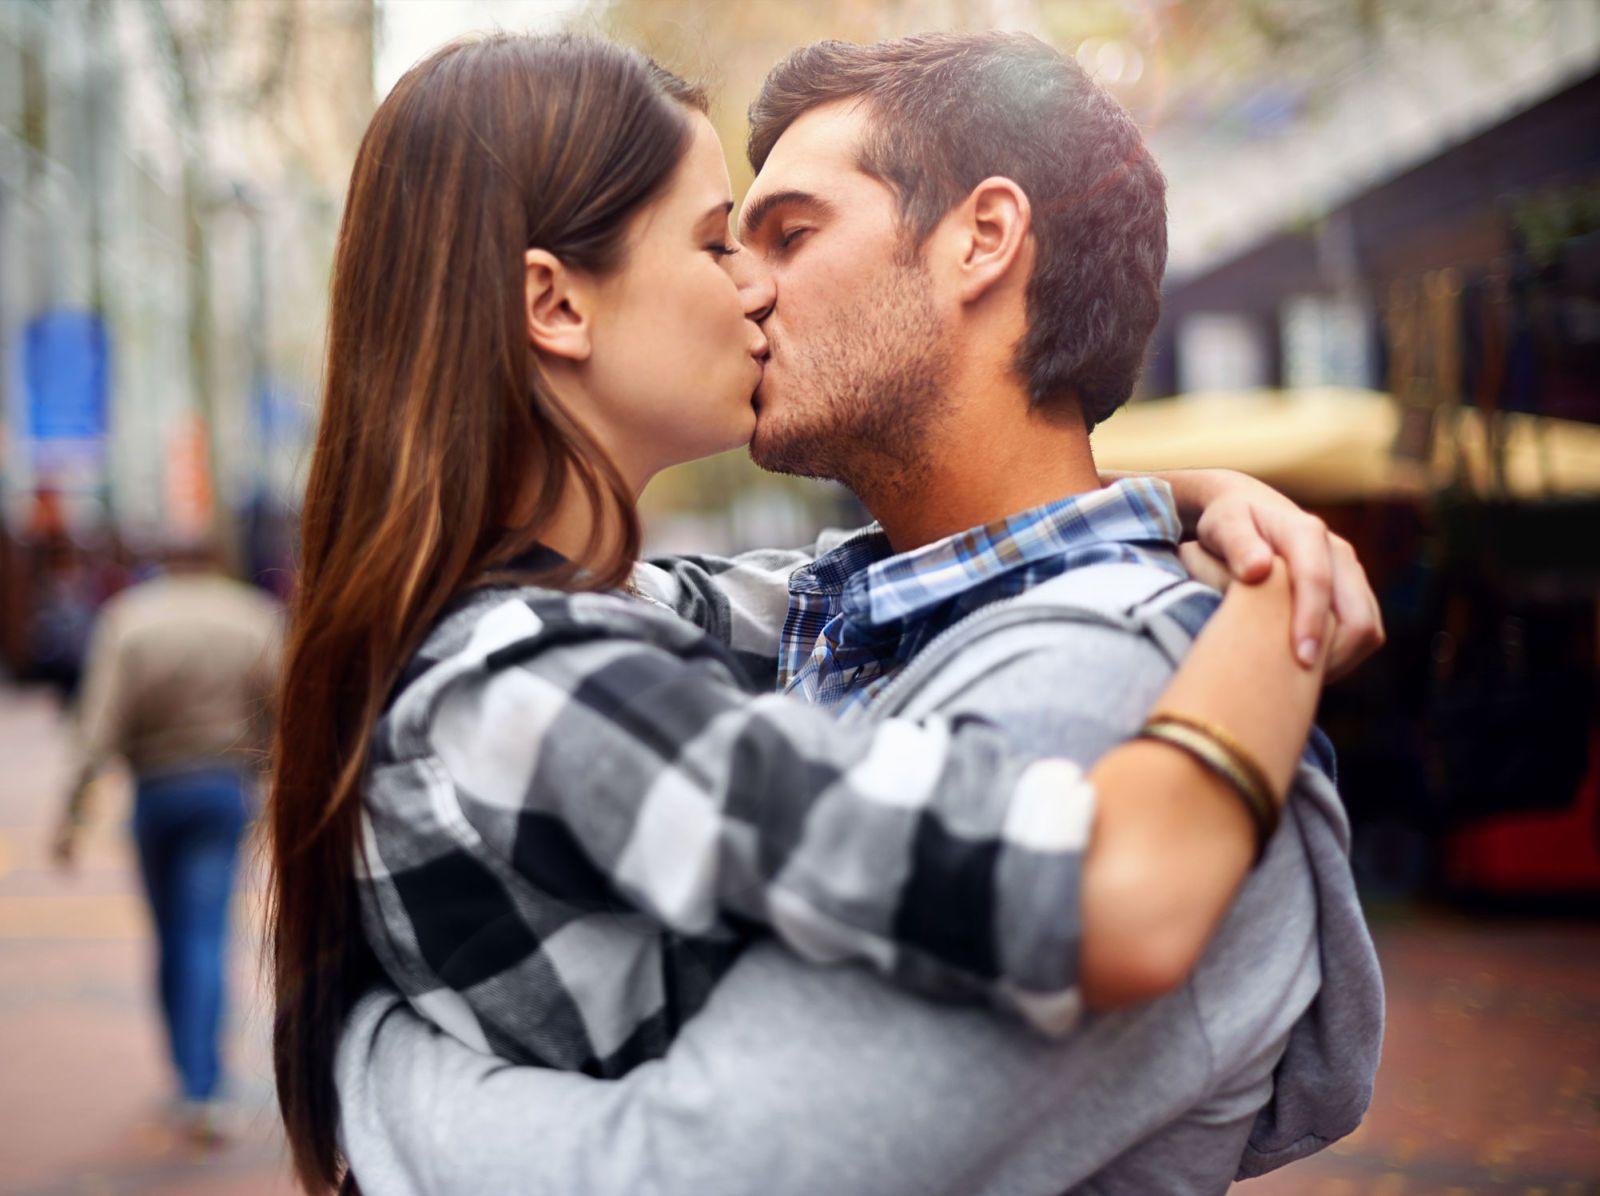 Come pomiciare bene yahoo dating